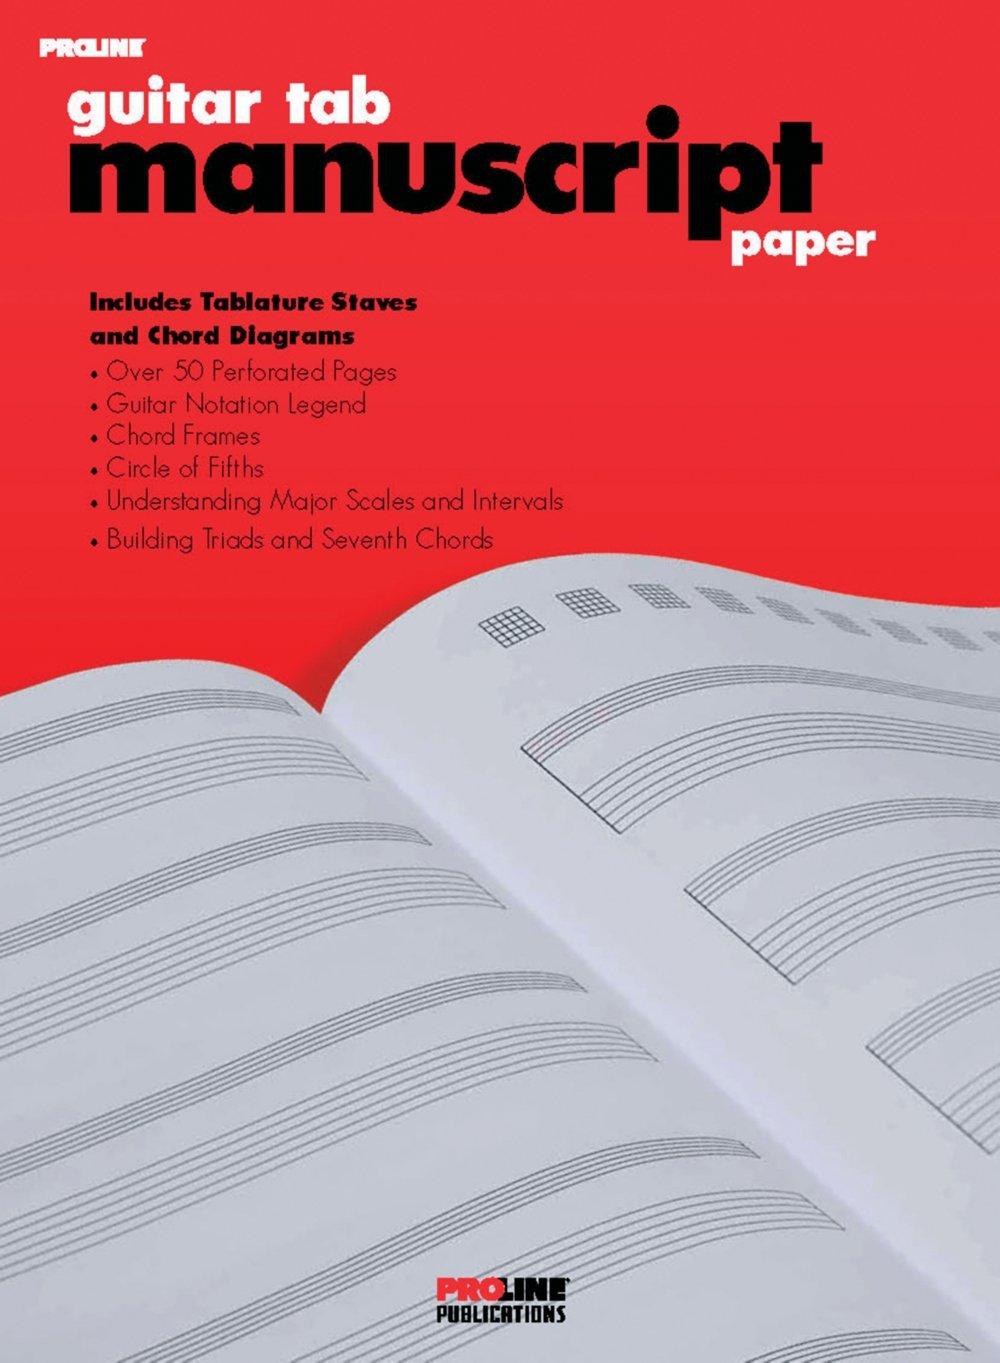 Manuscript Paper Guitar Tablature Manuscript Paper Standard